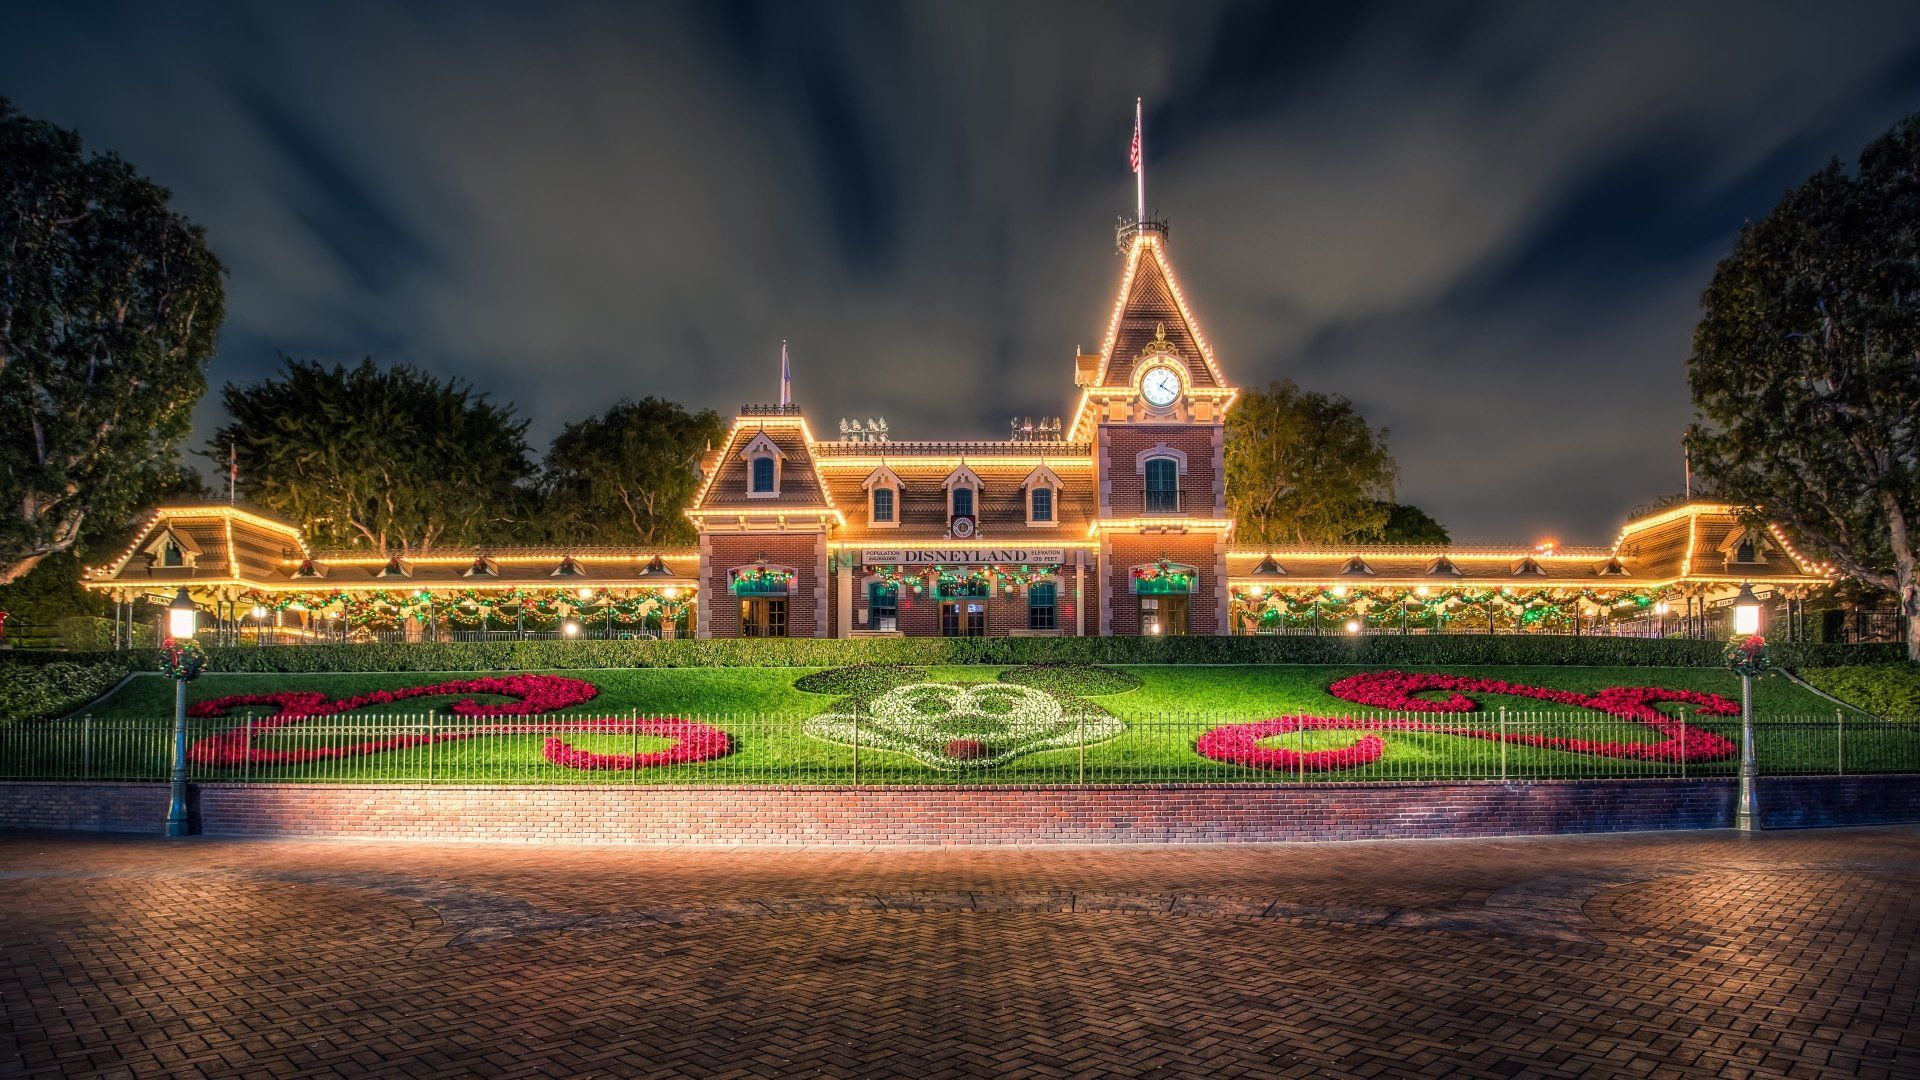 Disneyland 4k Wallpapers Top Free Disneyland 4k Backgrounds Wallpaperaccess